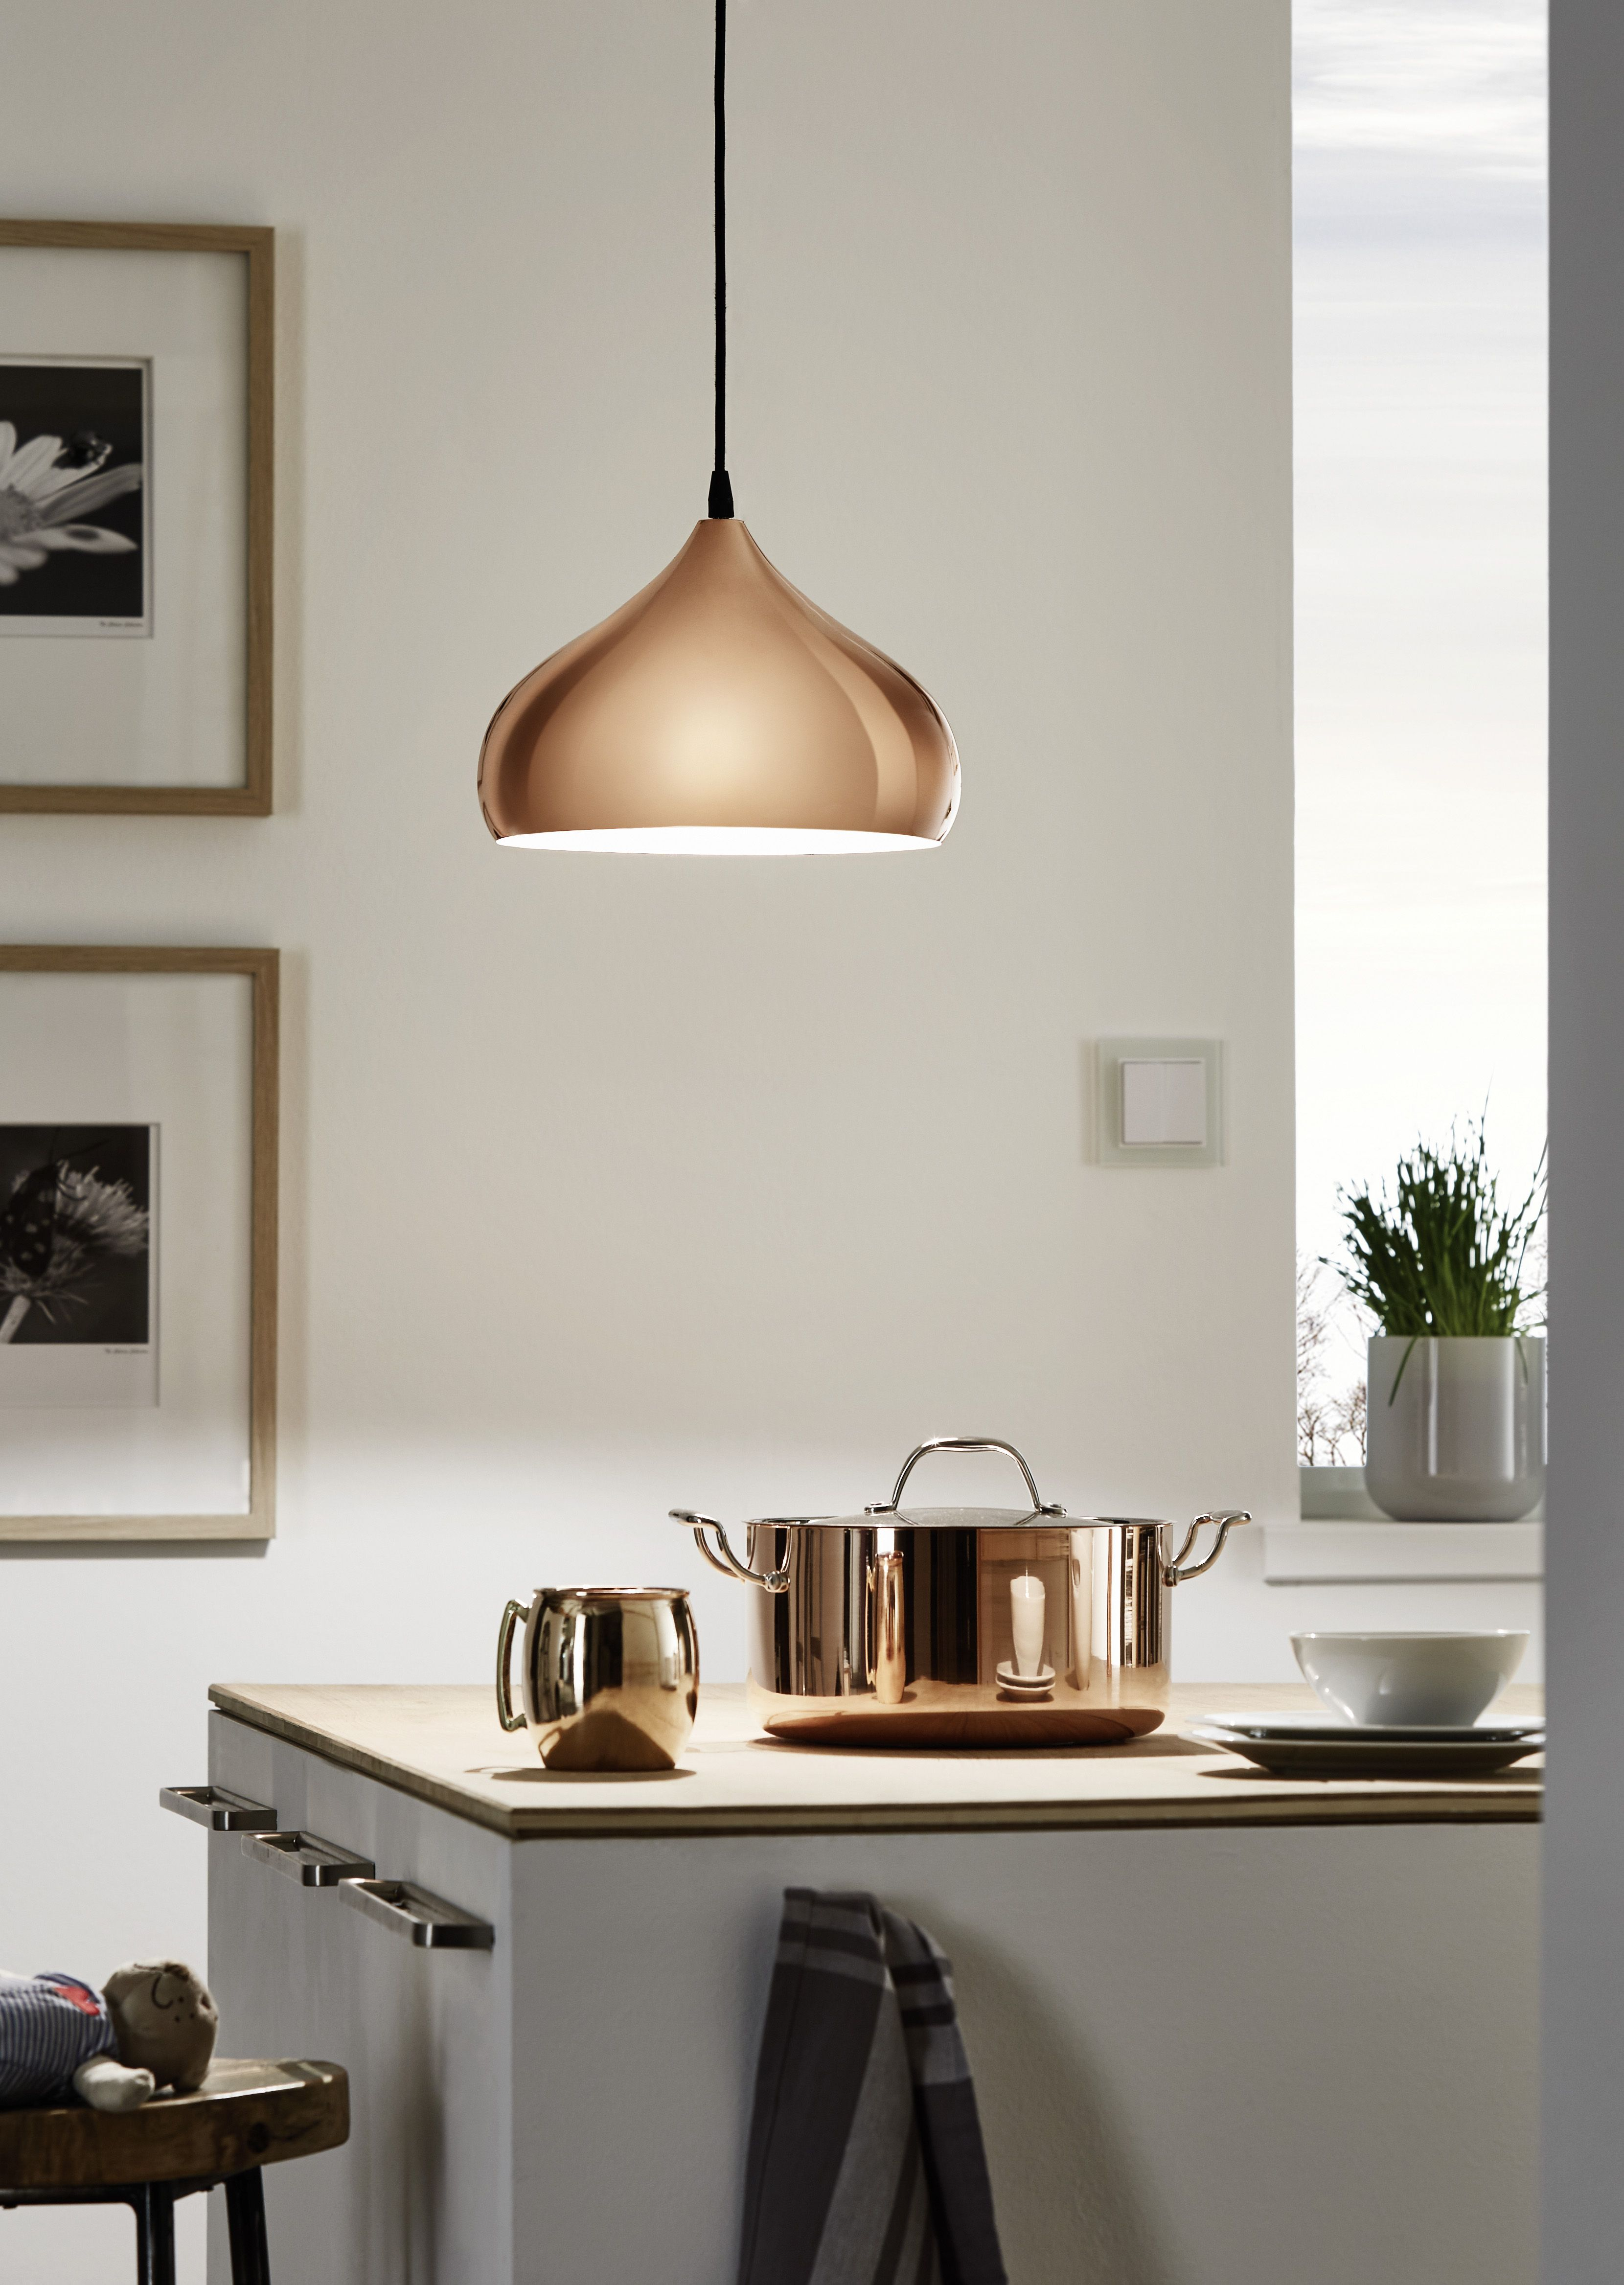 Eglo Lighting Hapton Vintage Copper 1 Lamp Pendant Light Kitchen